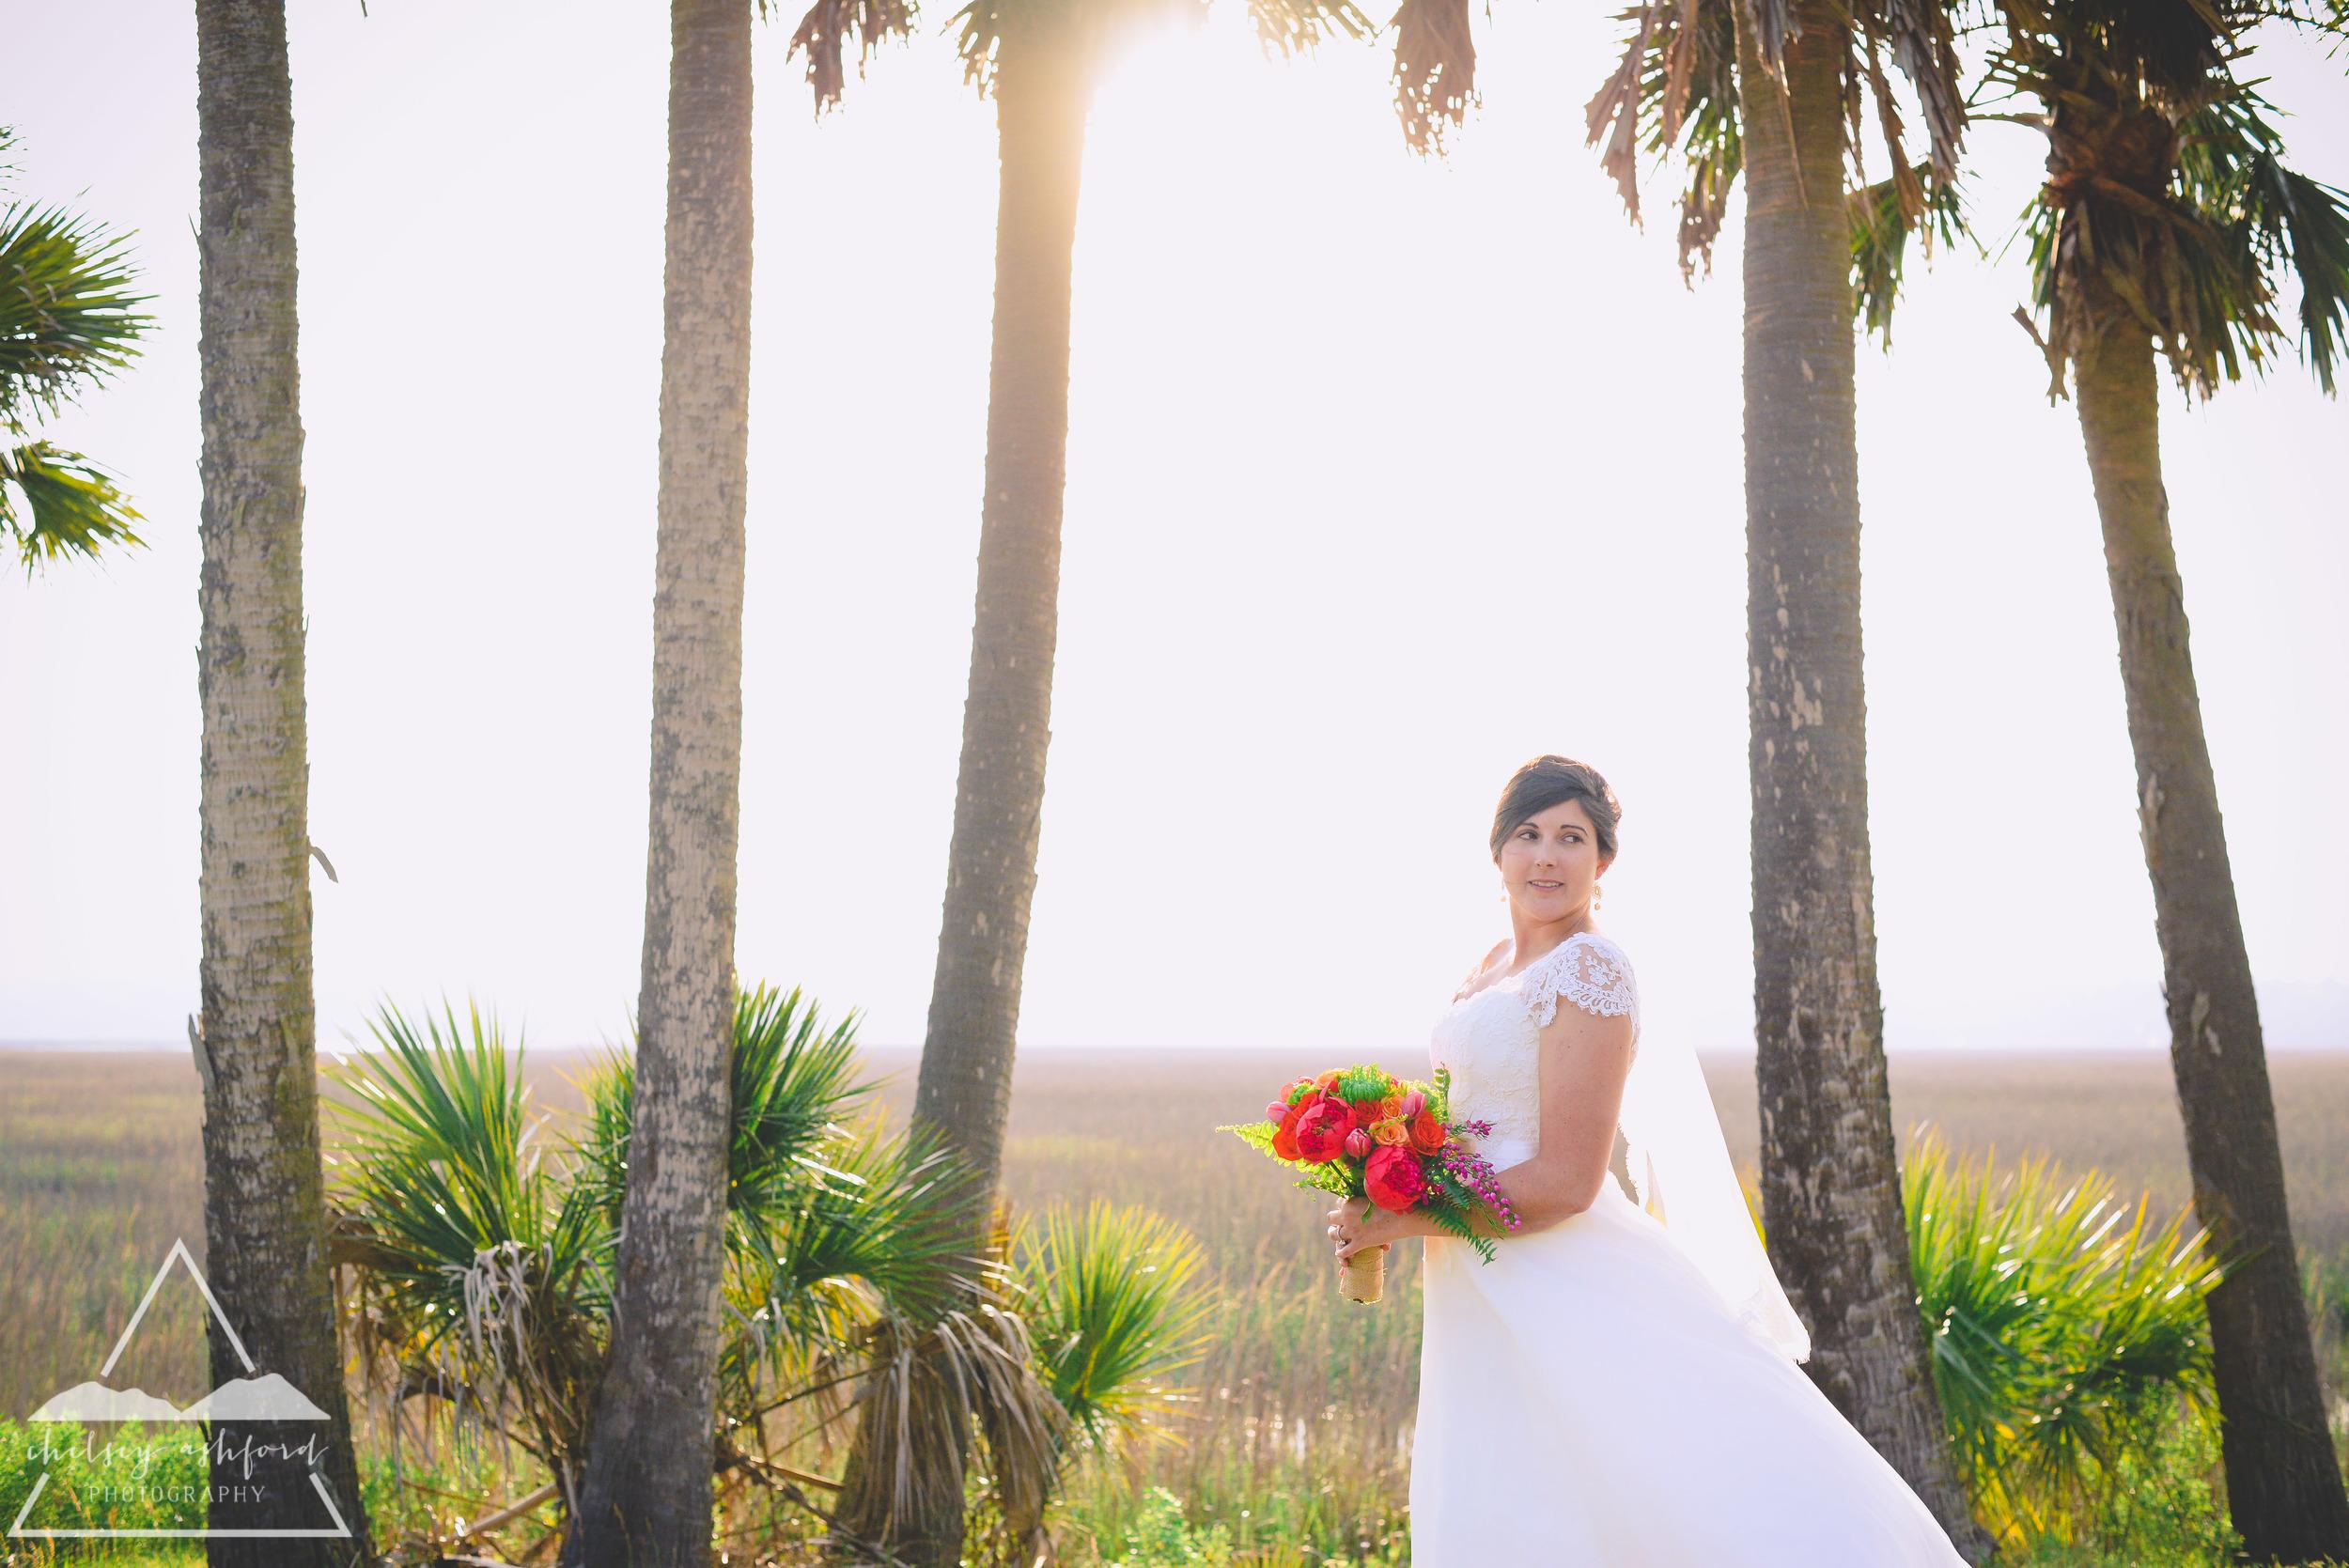 Sylvia_bridals_web-22.jpg